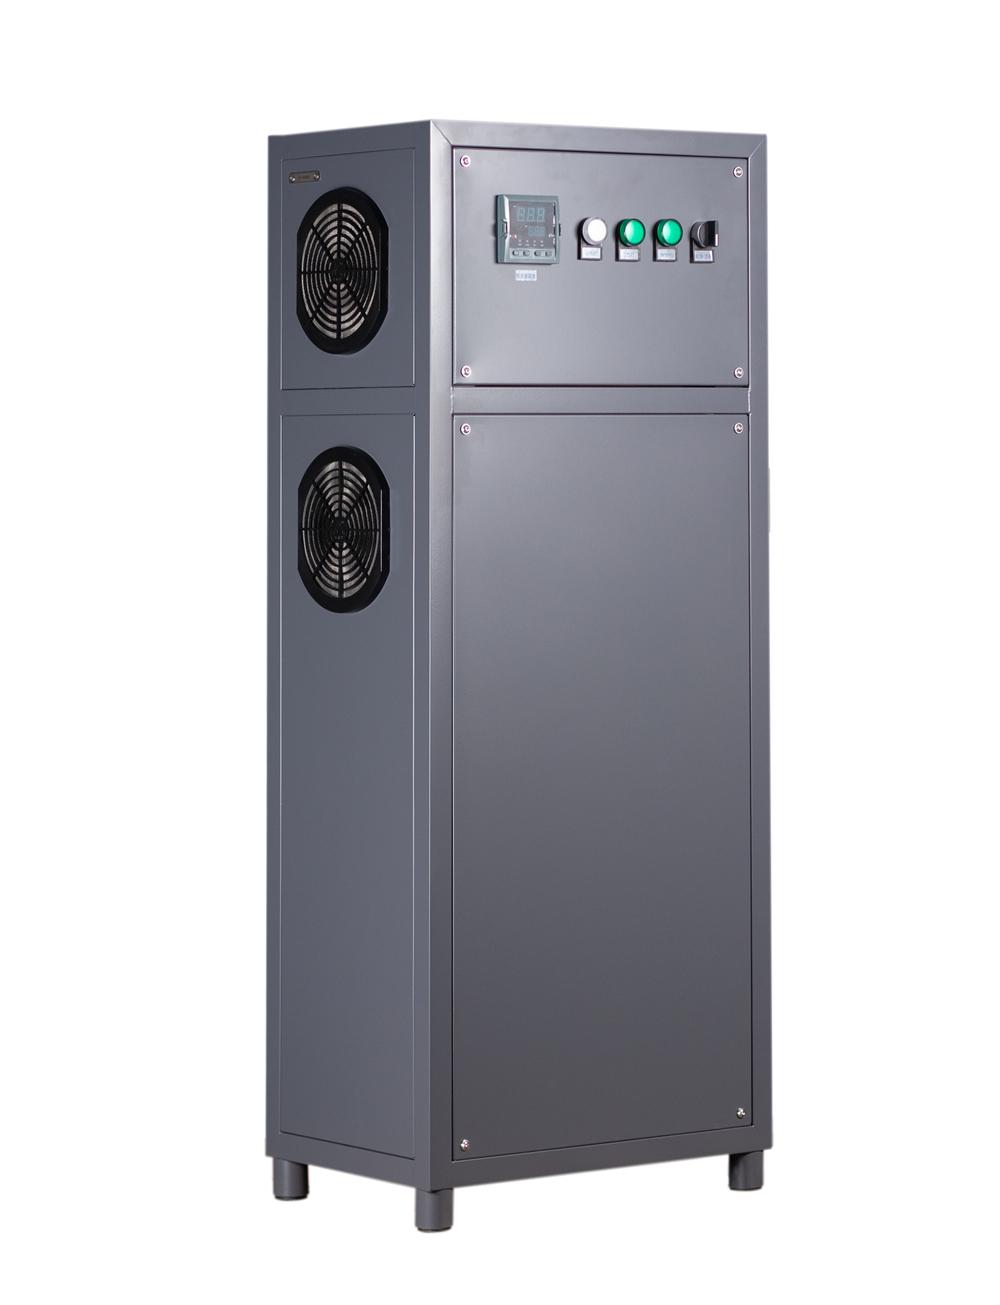 Озона уничтожить устройство DRS серии